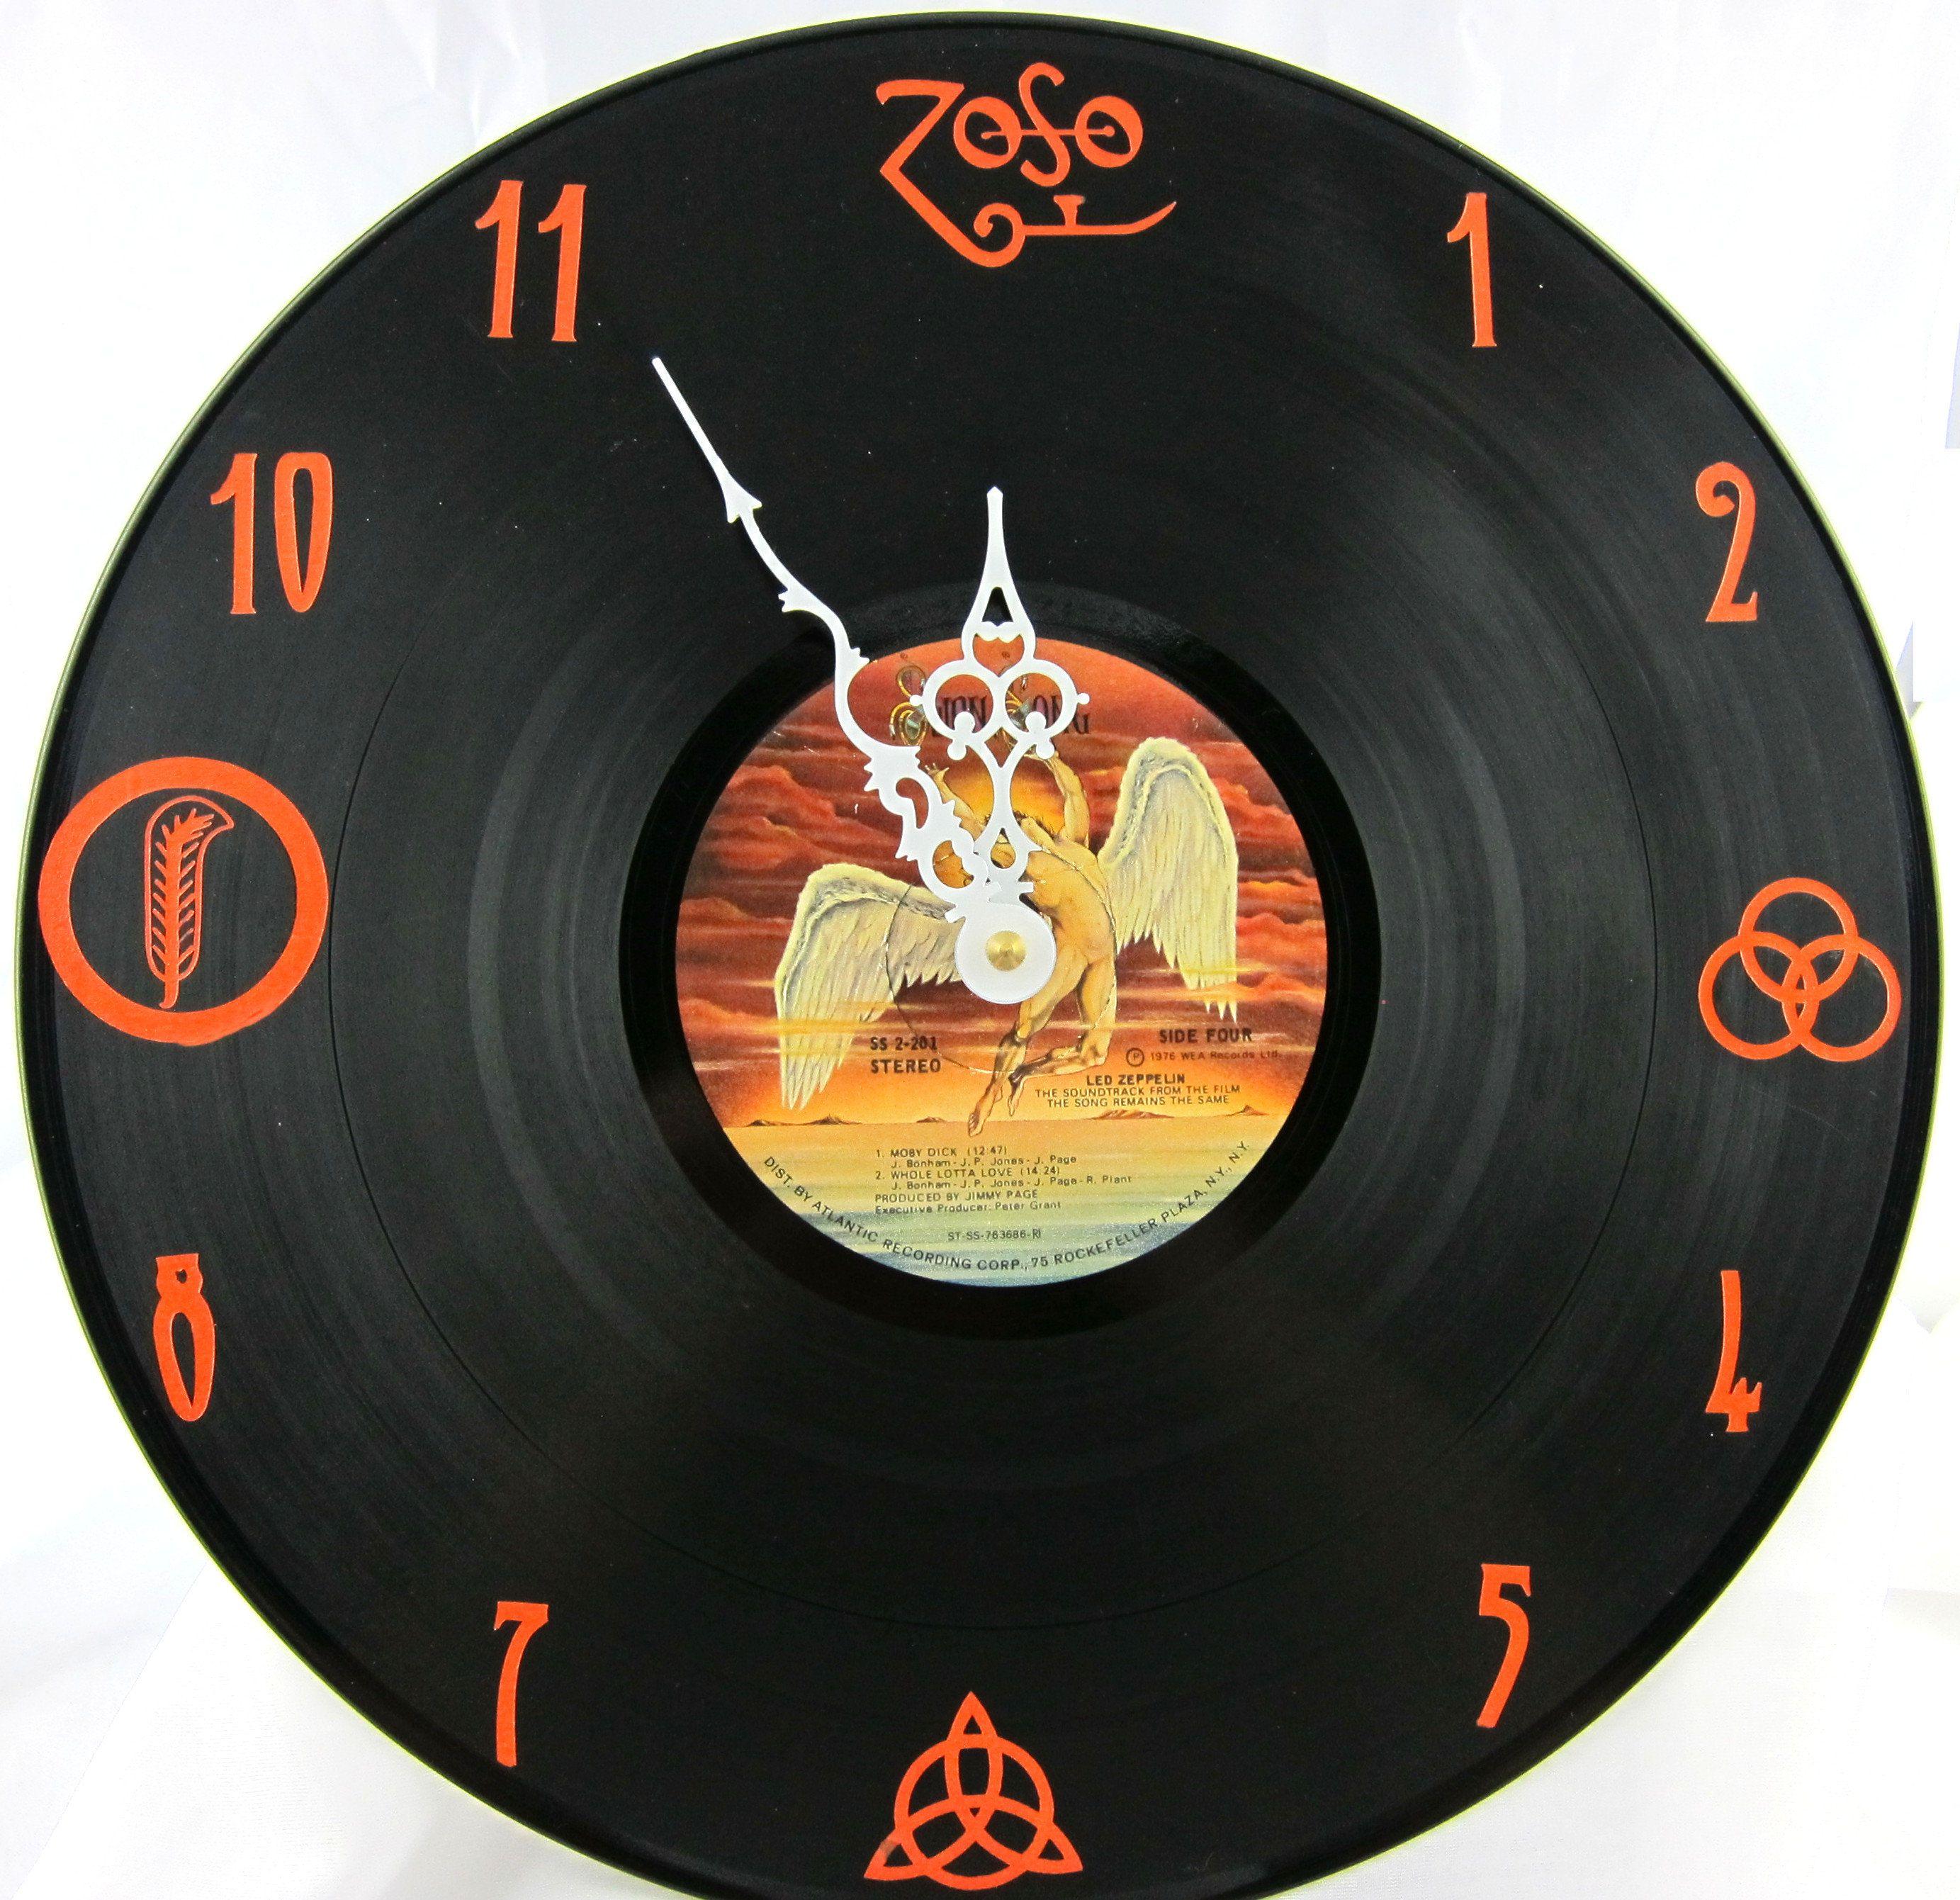 Moby Run On Nostalgic Music Album Covers Album Covers Music Albums